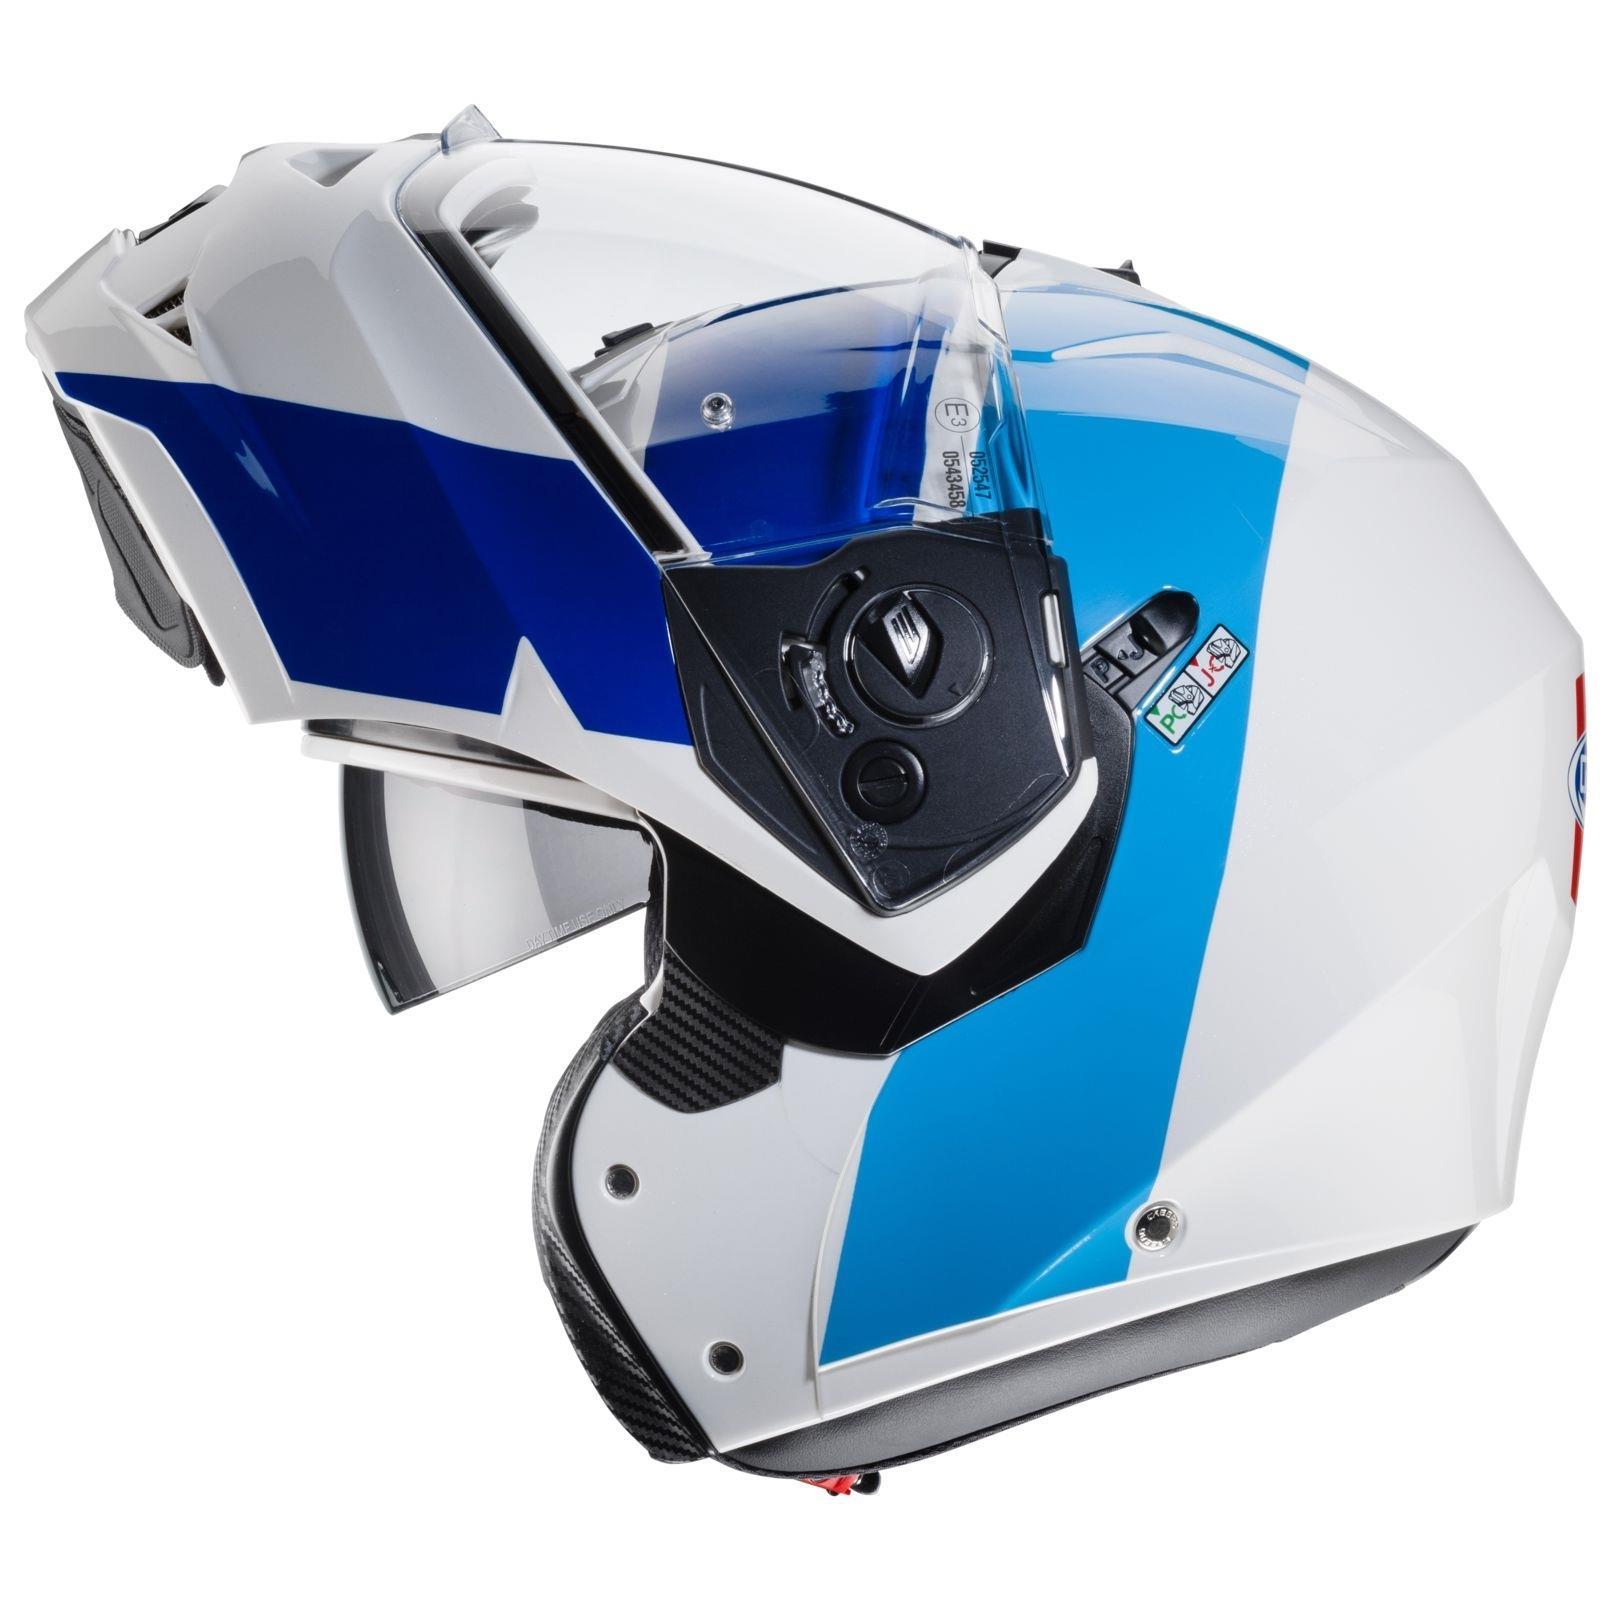 Caberg-Klapp-Helm-Duke-II-2-Motorrad-Belueftet-Sonnenblende-Pinlock-Visier-Jet Indexbild 31